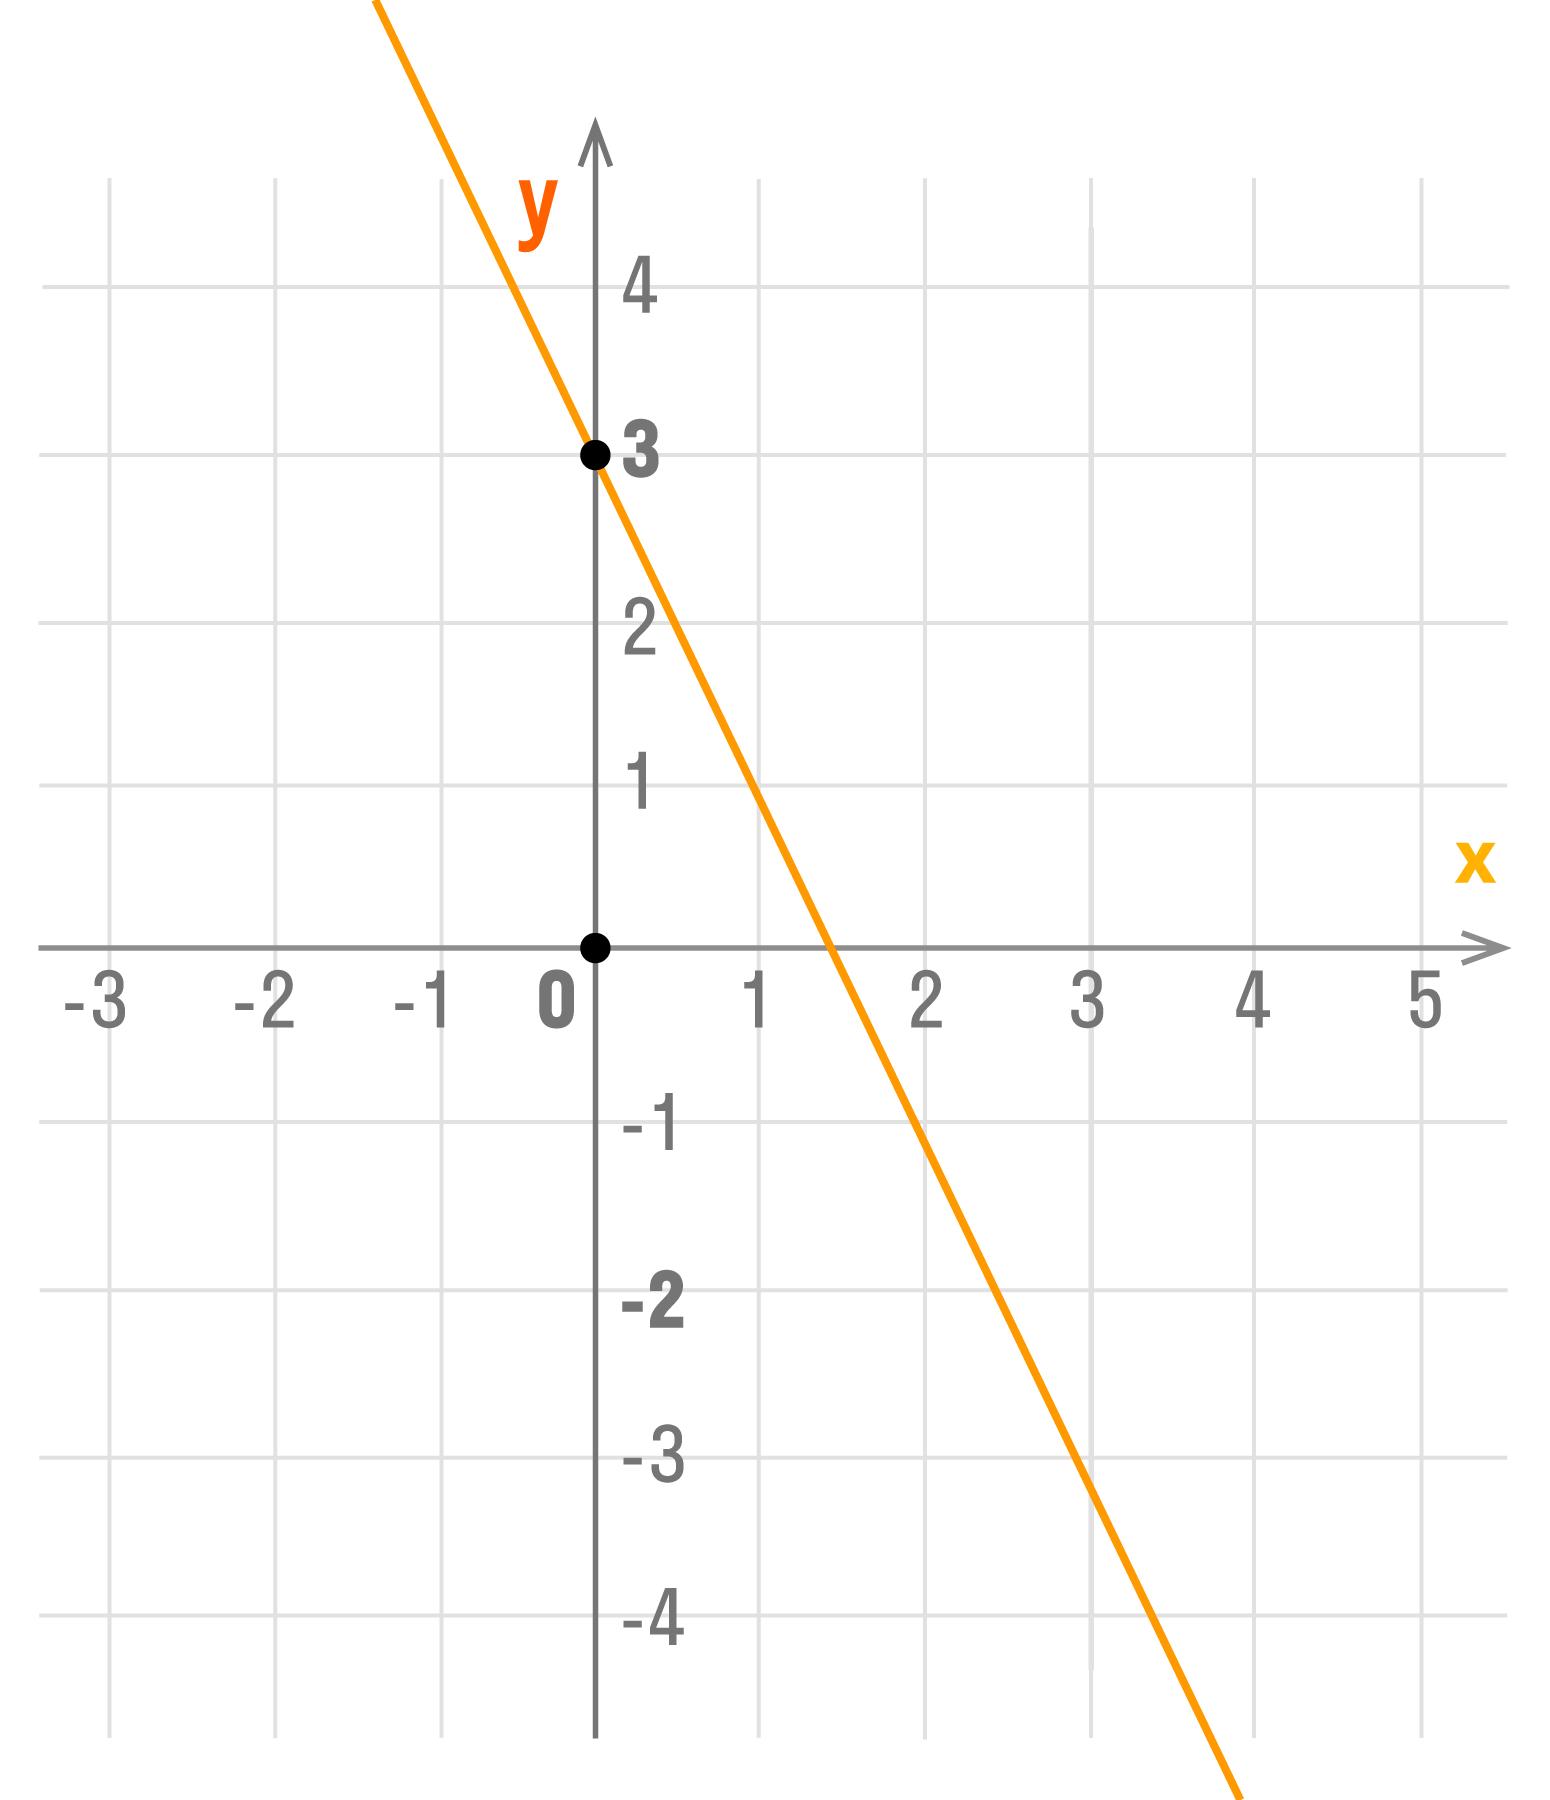 график функции y = kx + b при  k < 0 и b > 0